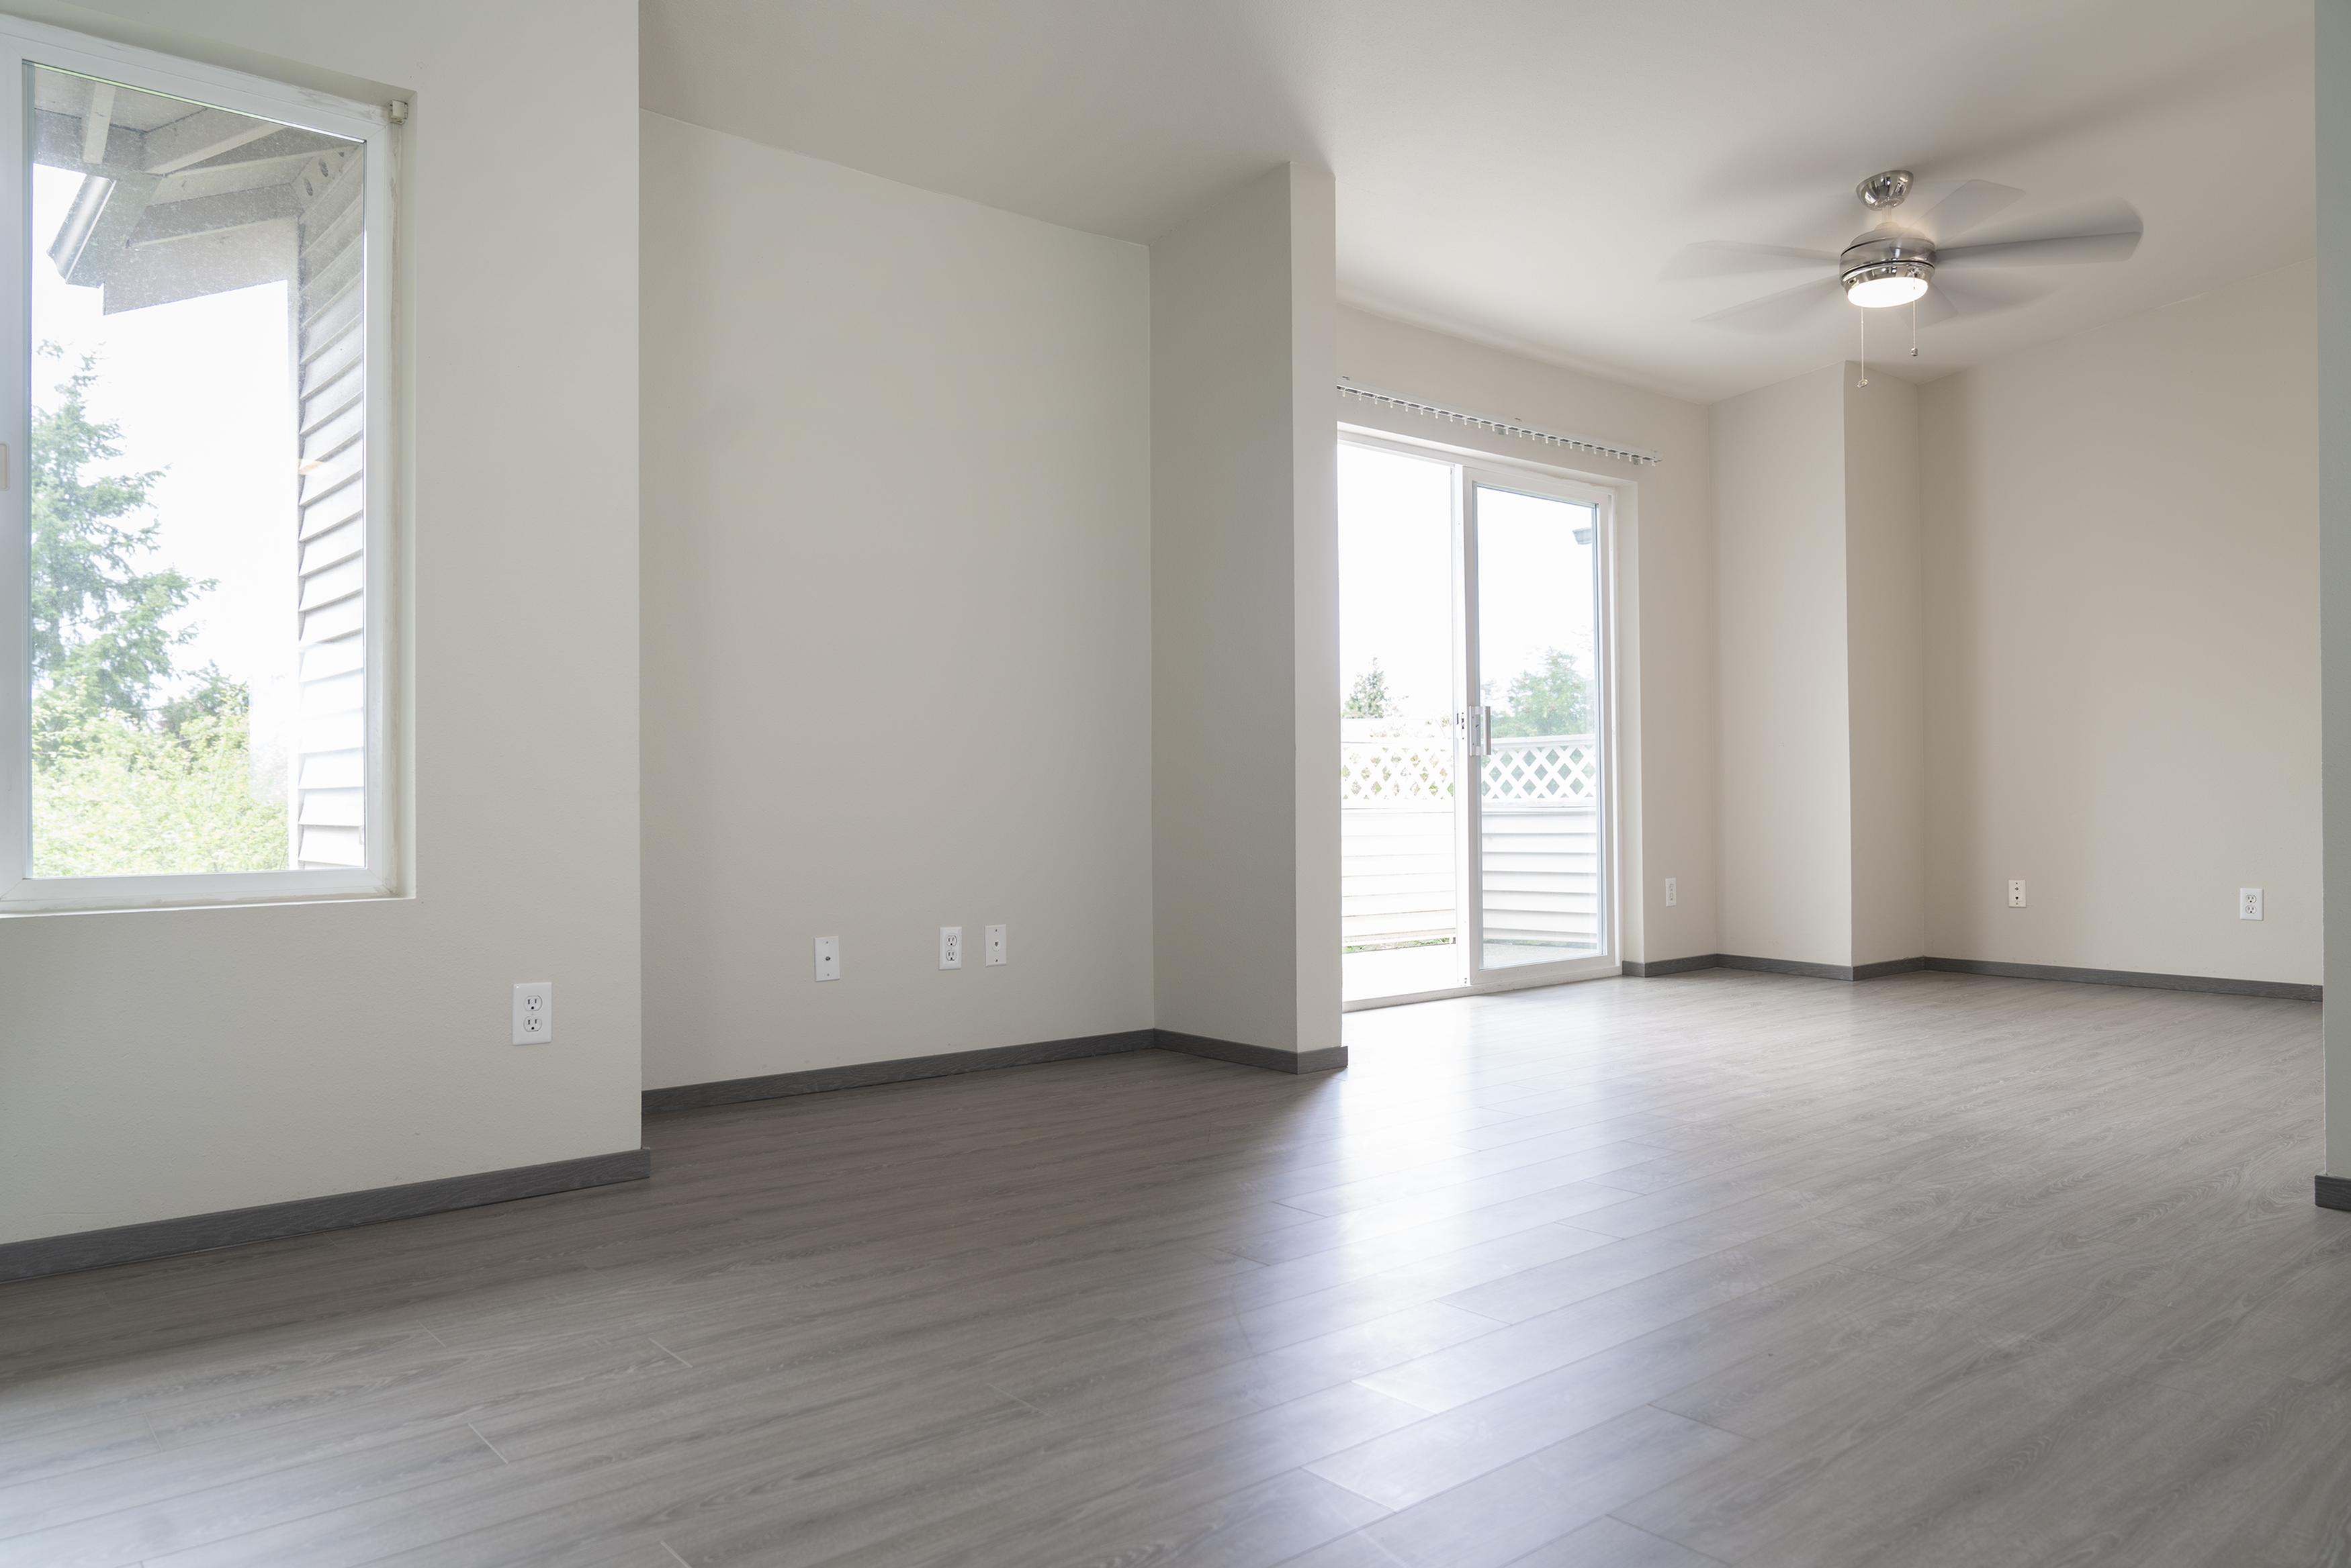 Image of Upgraded Luxury Plank Vinyl  Flooring for Nantucket Gate